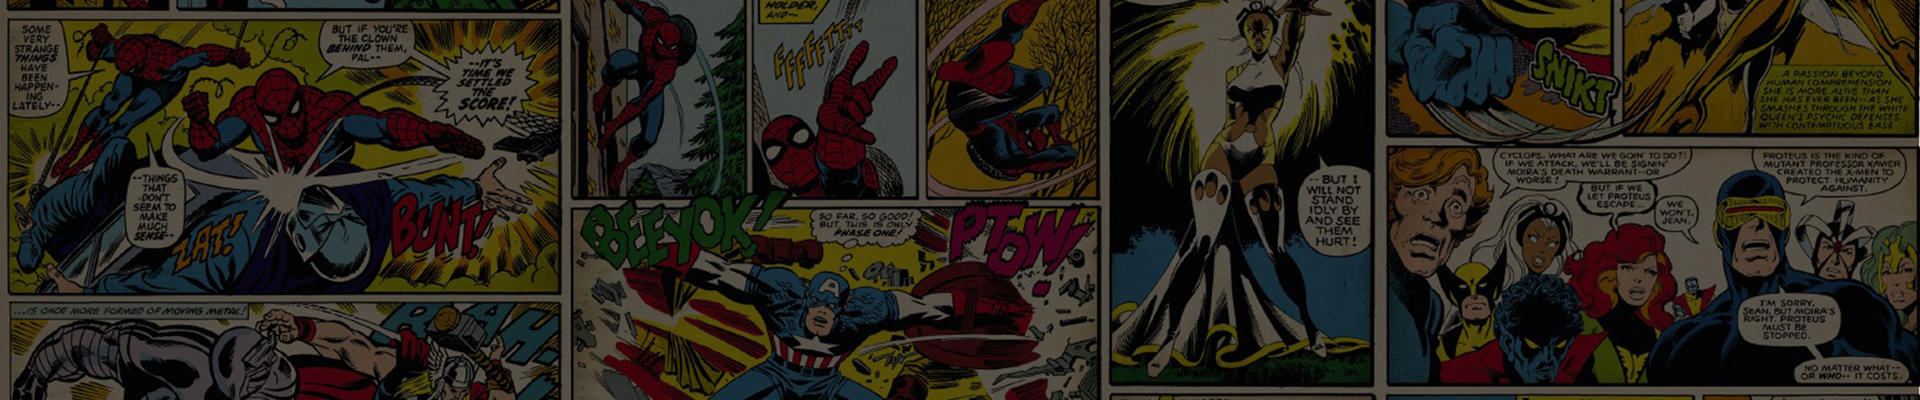 Comics article